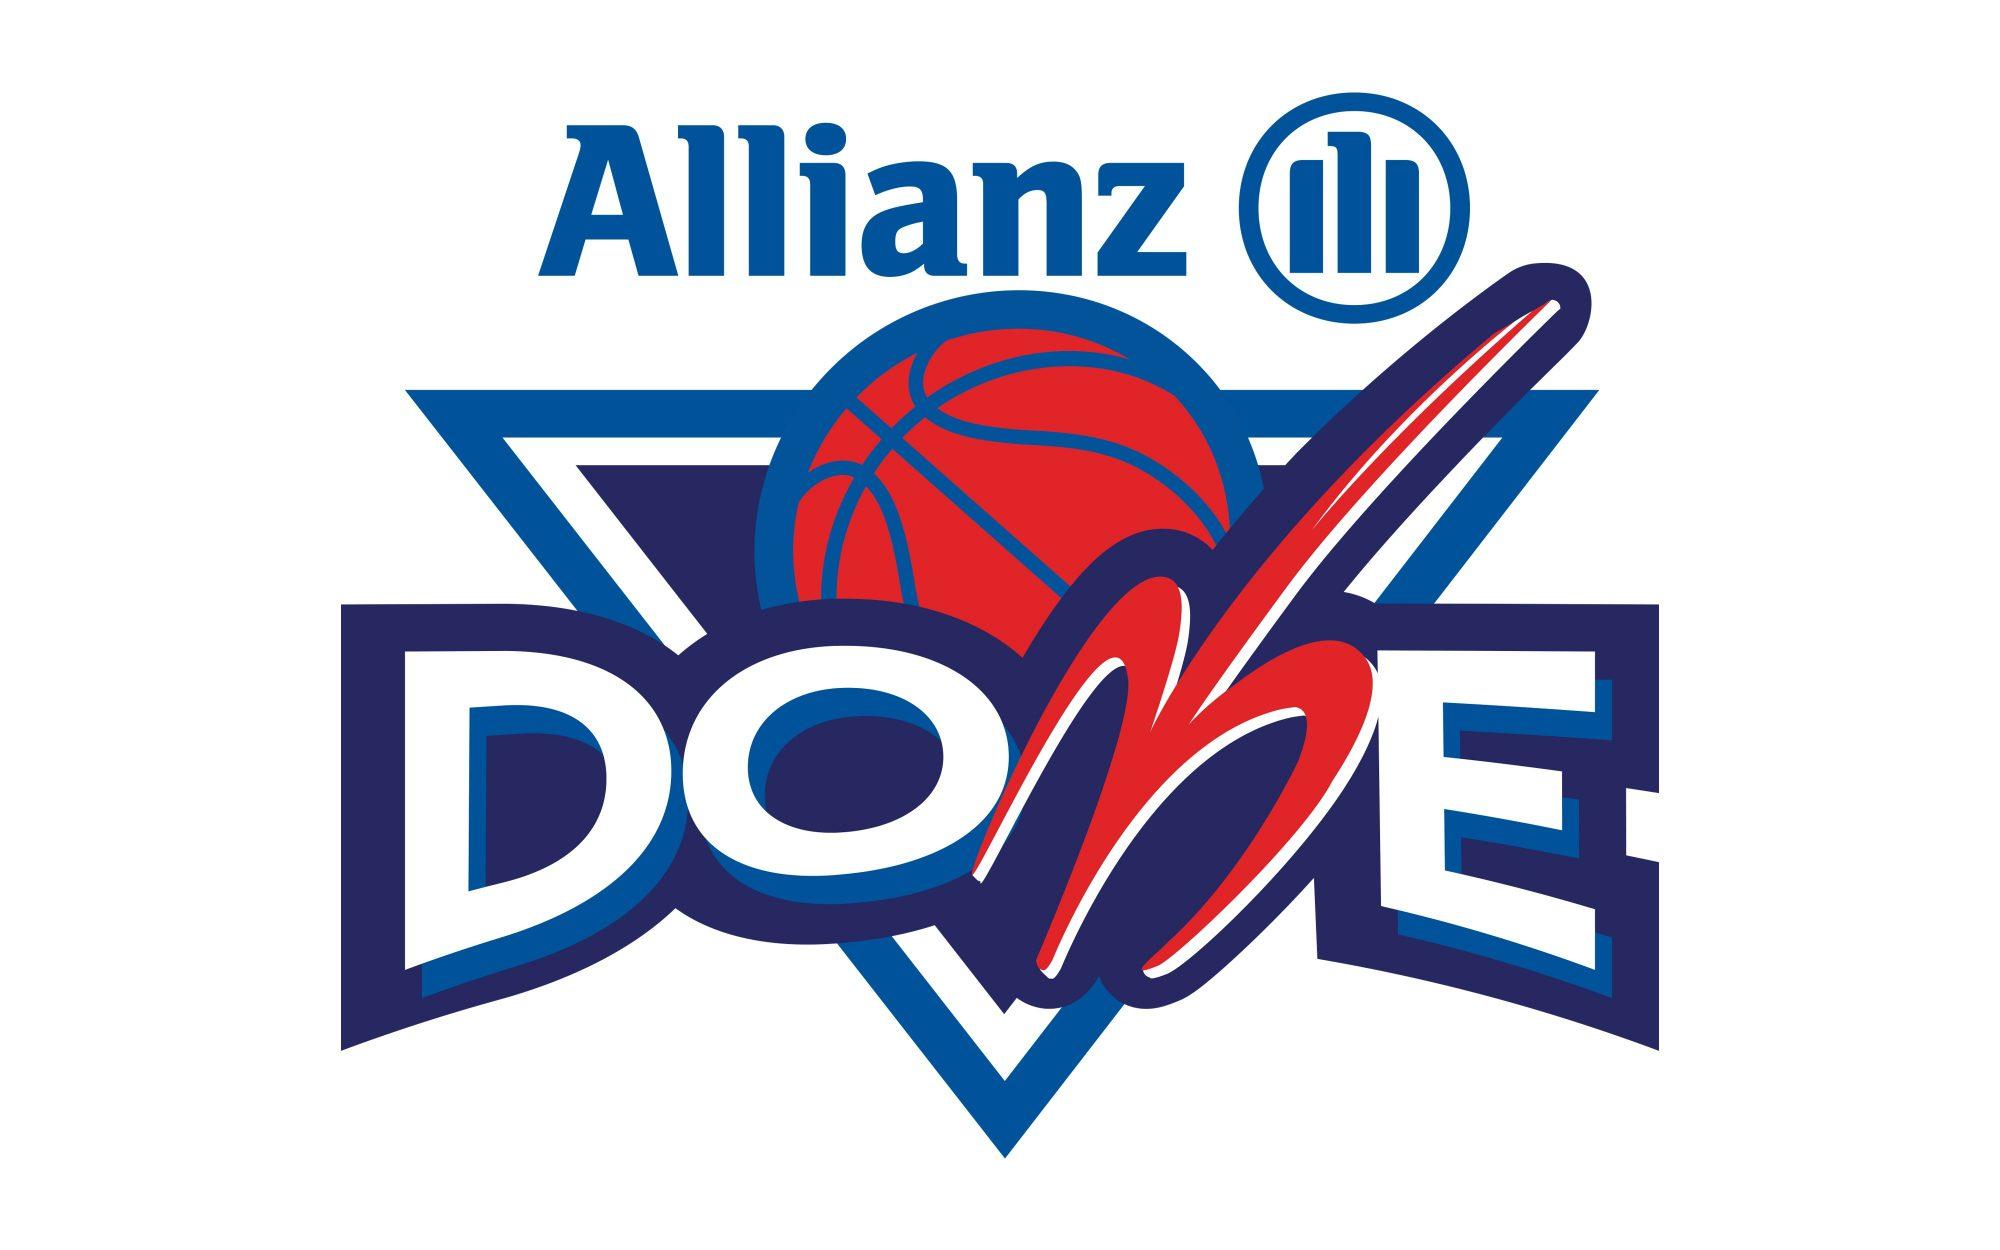 Allianz Dome - Logo parquet